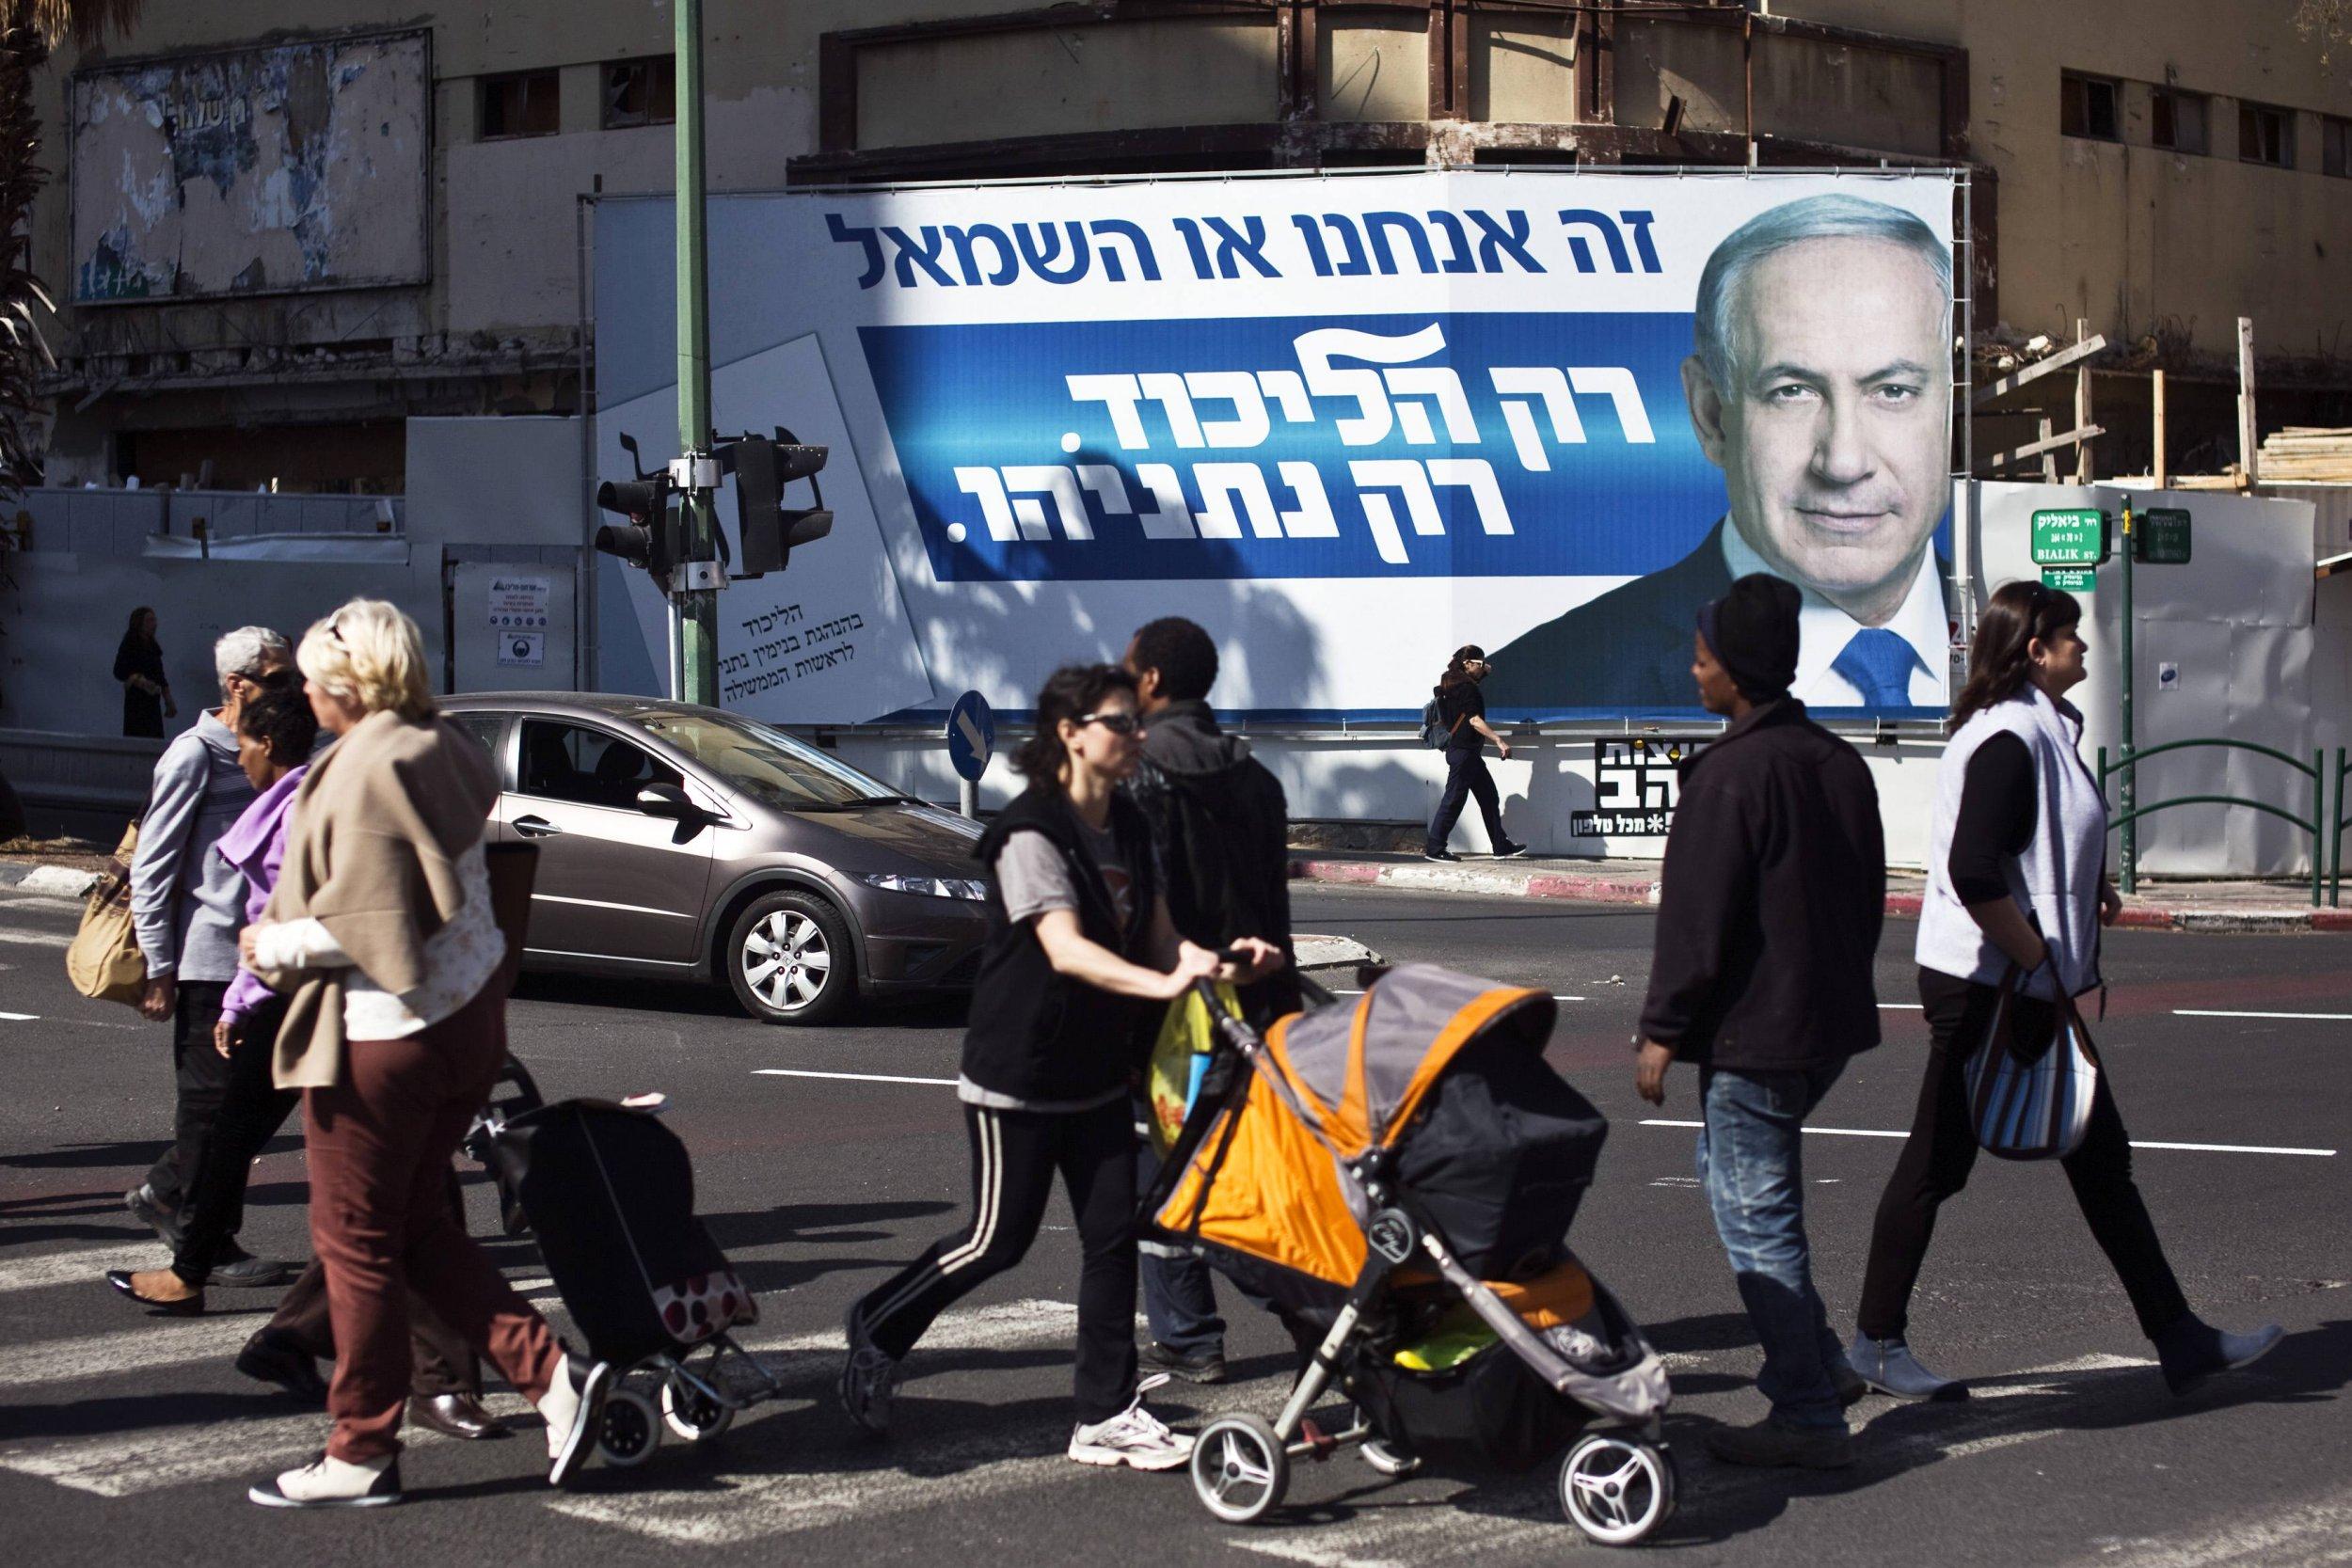 2015-03-16T170155Z_2032180994_GM1EB3H02SL01_RTRMADP_3_ISRAEL-ELECTION